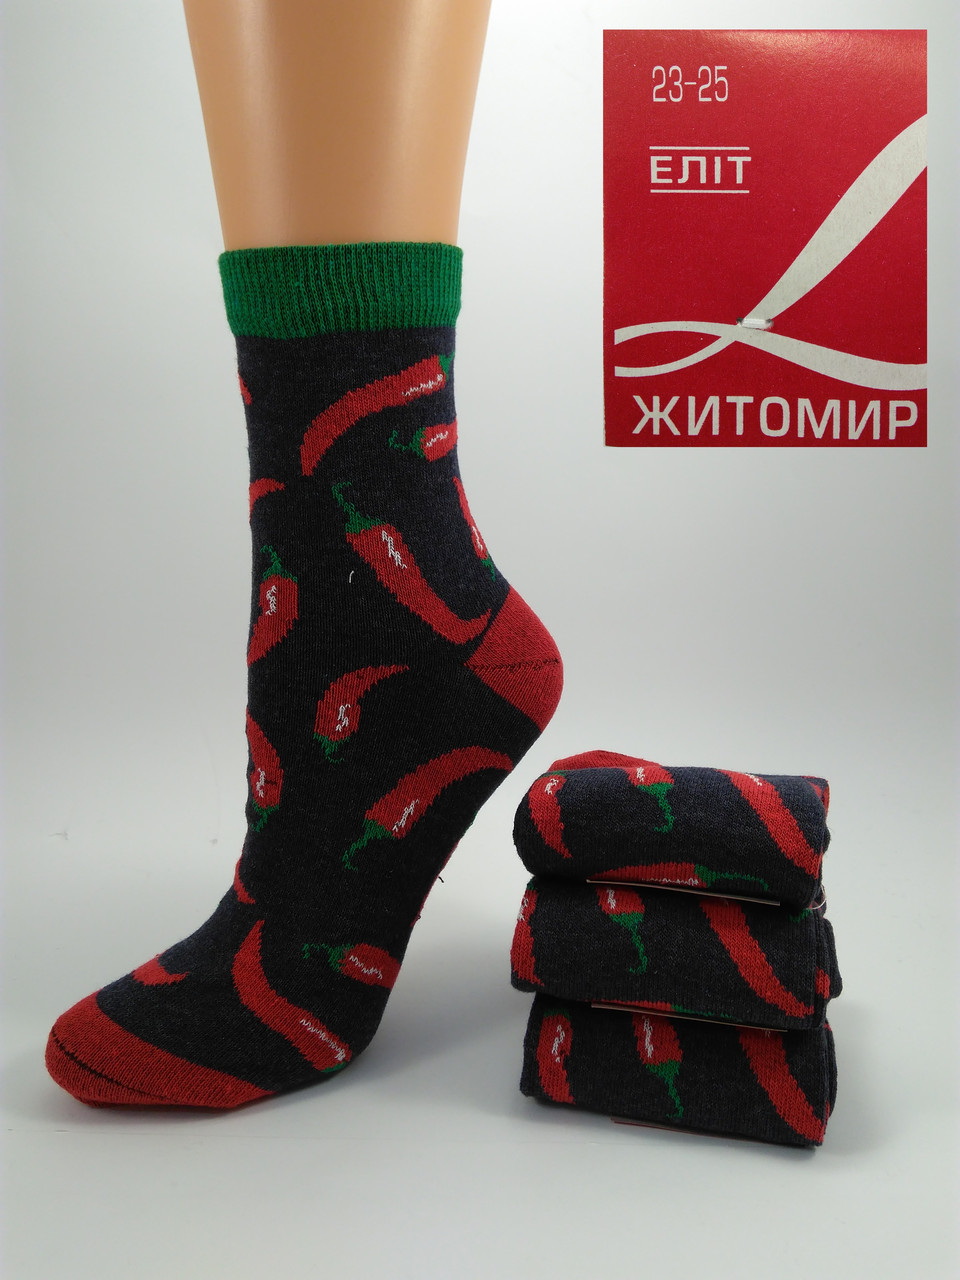 Женские носки Перец